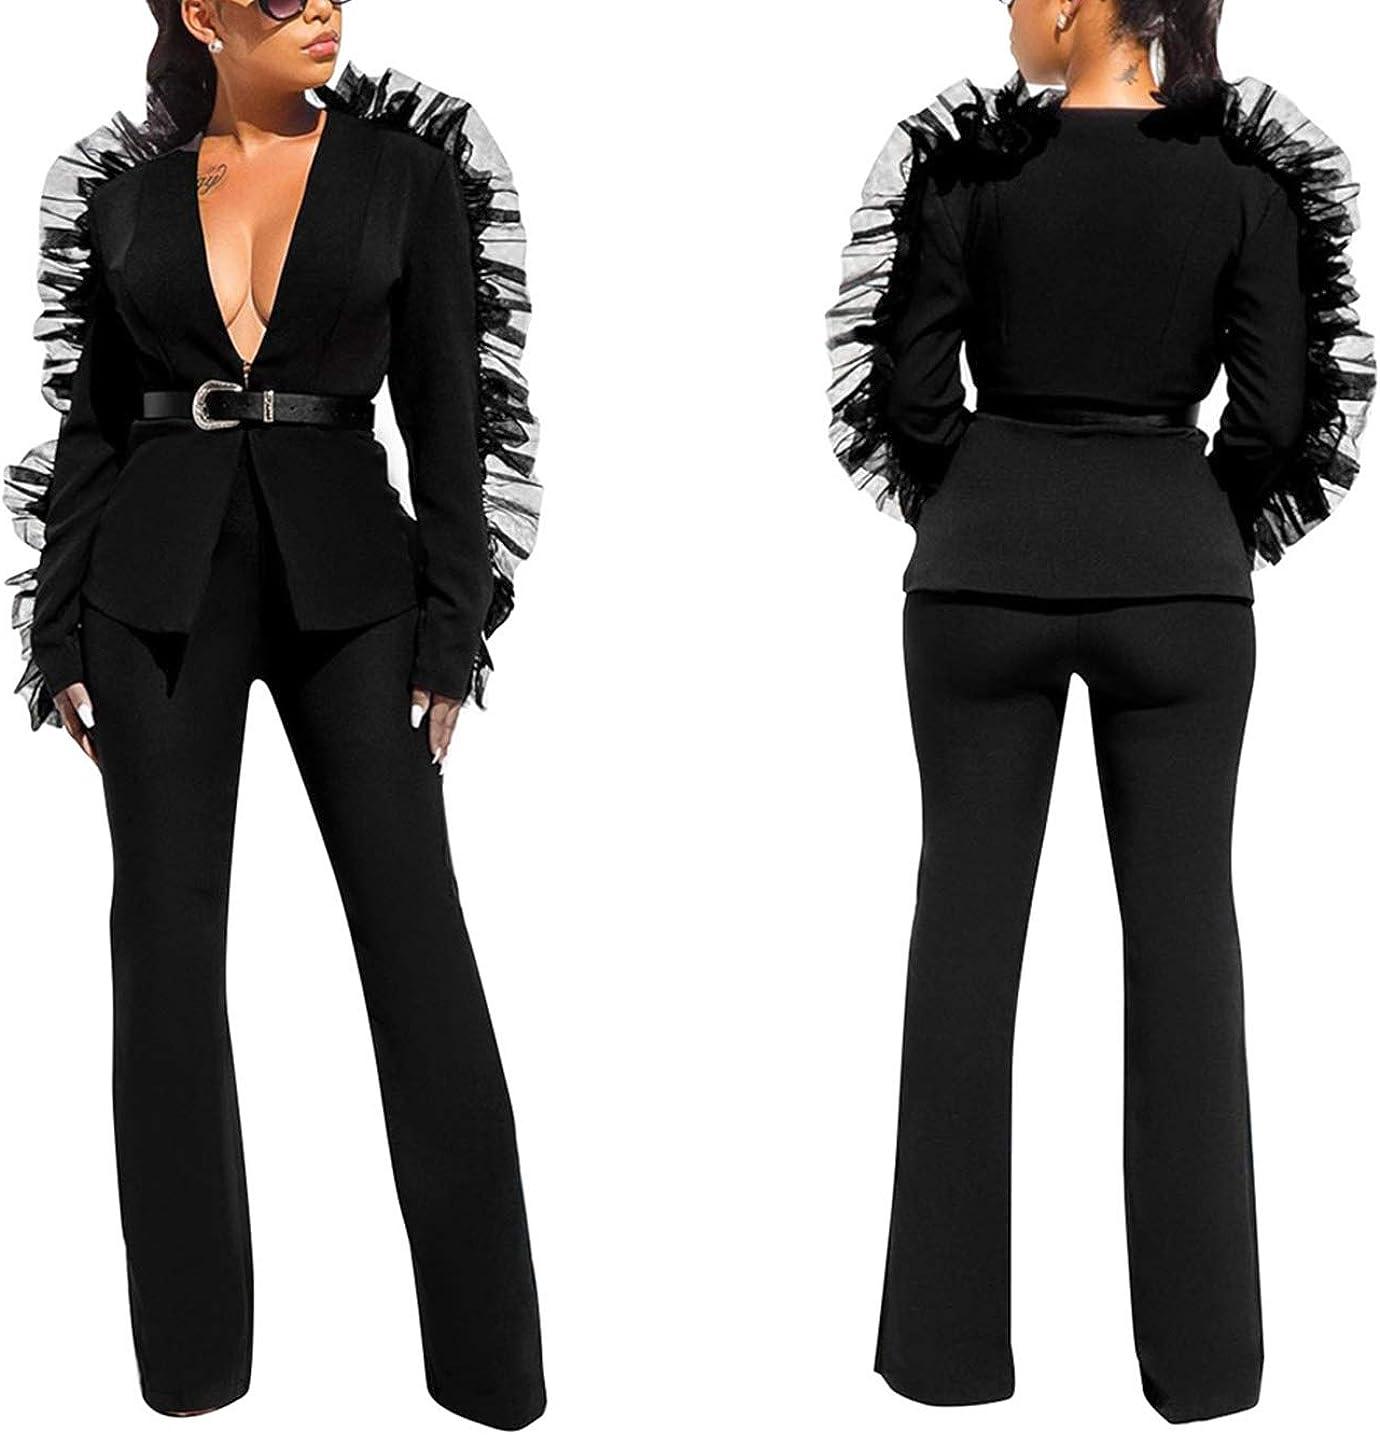 Amazon.com: 2 piezas de trajes para mujer de manga larga ...